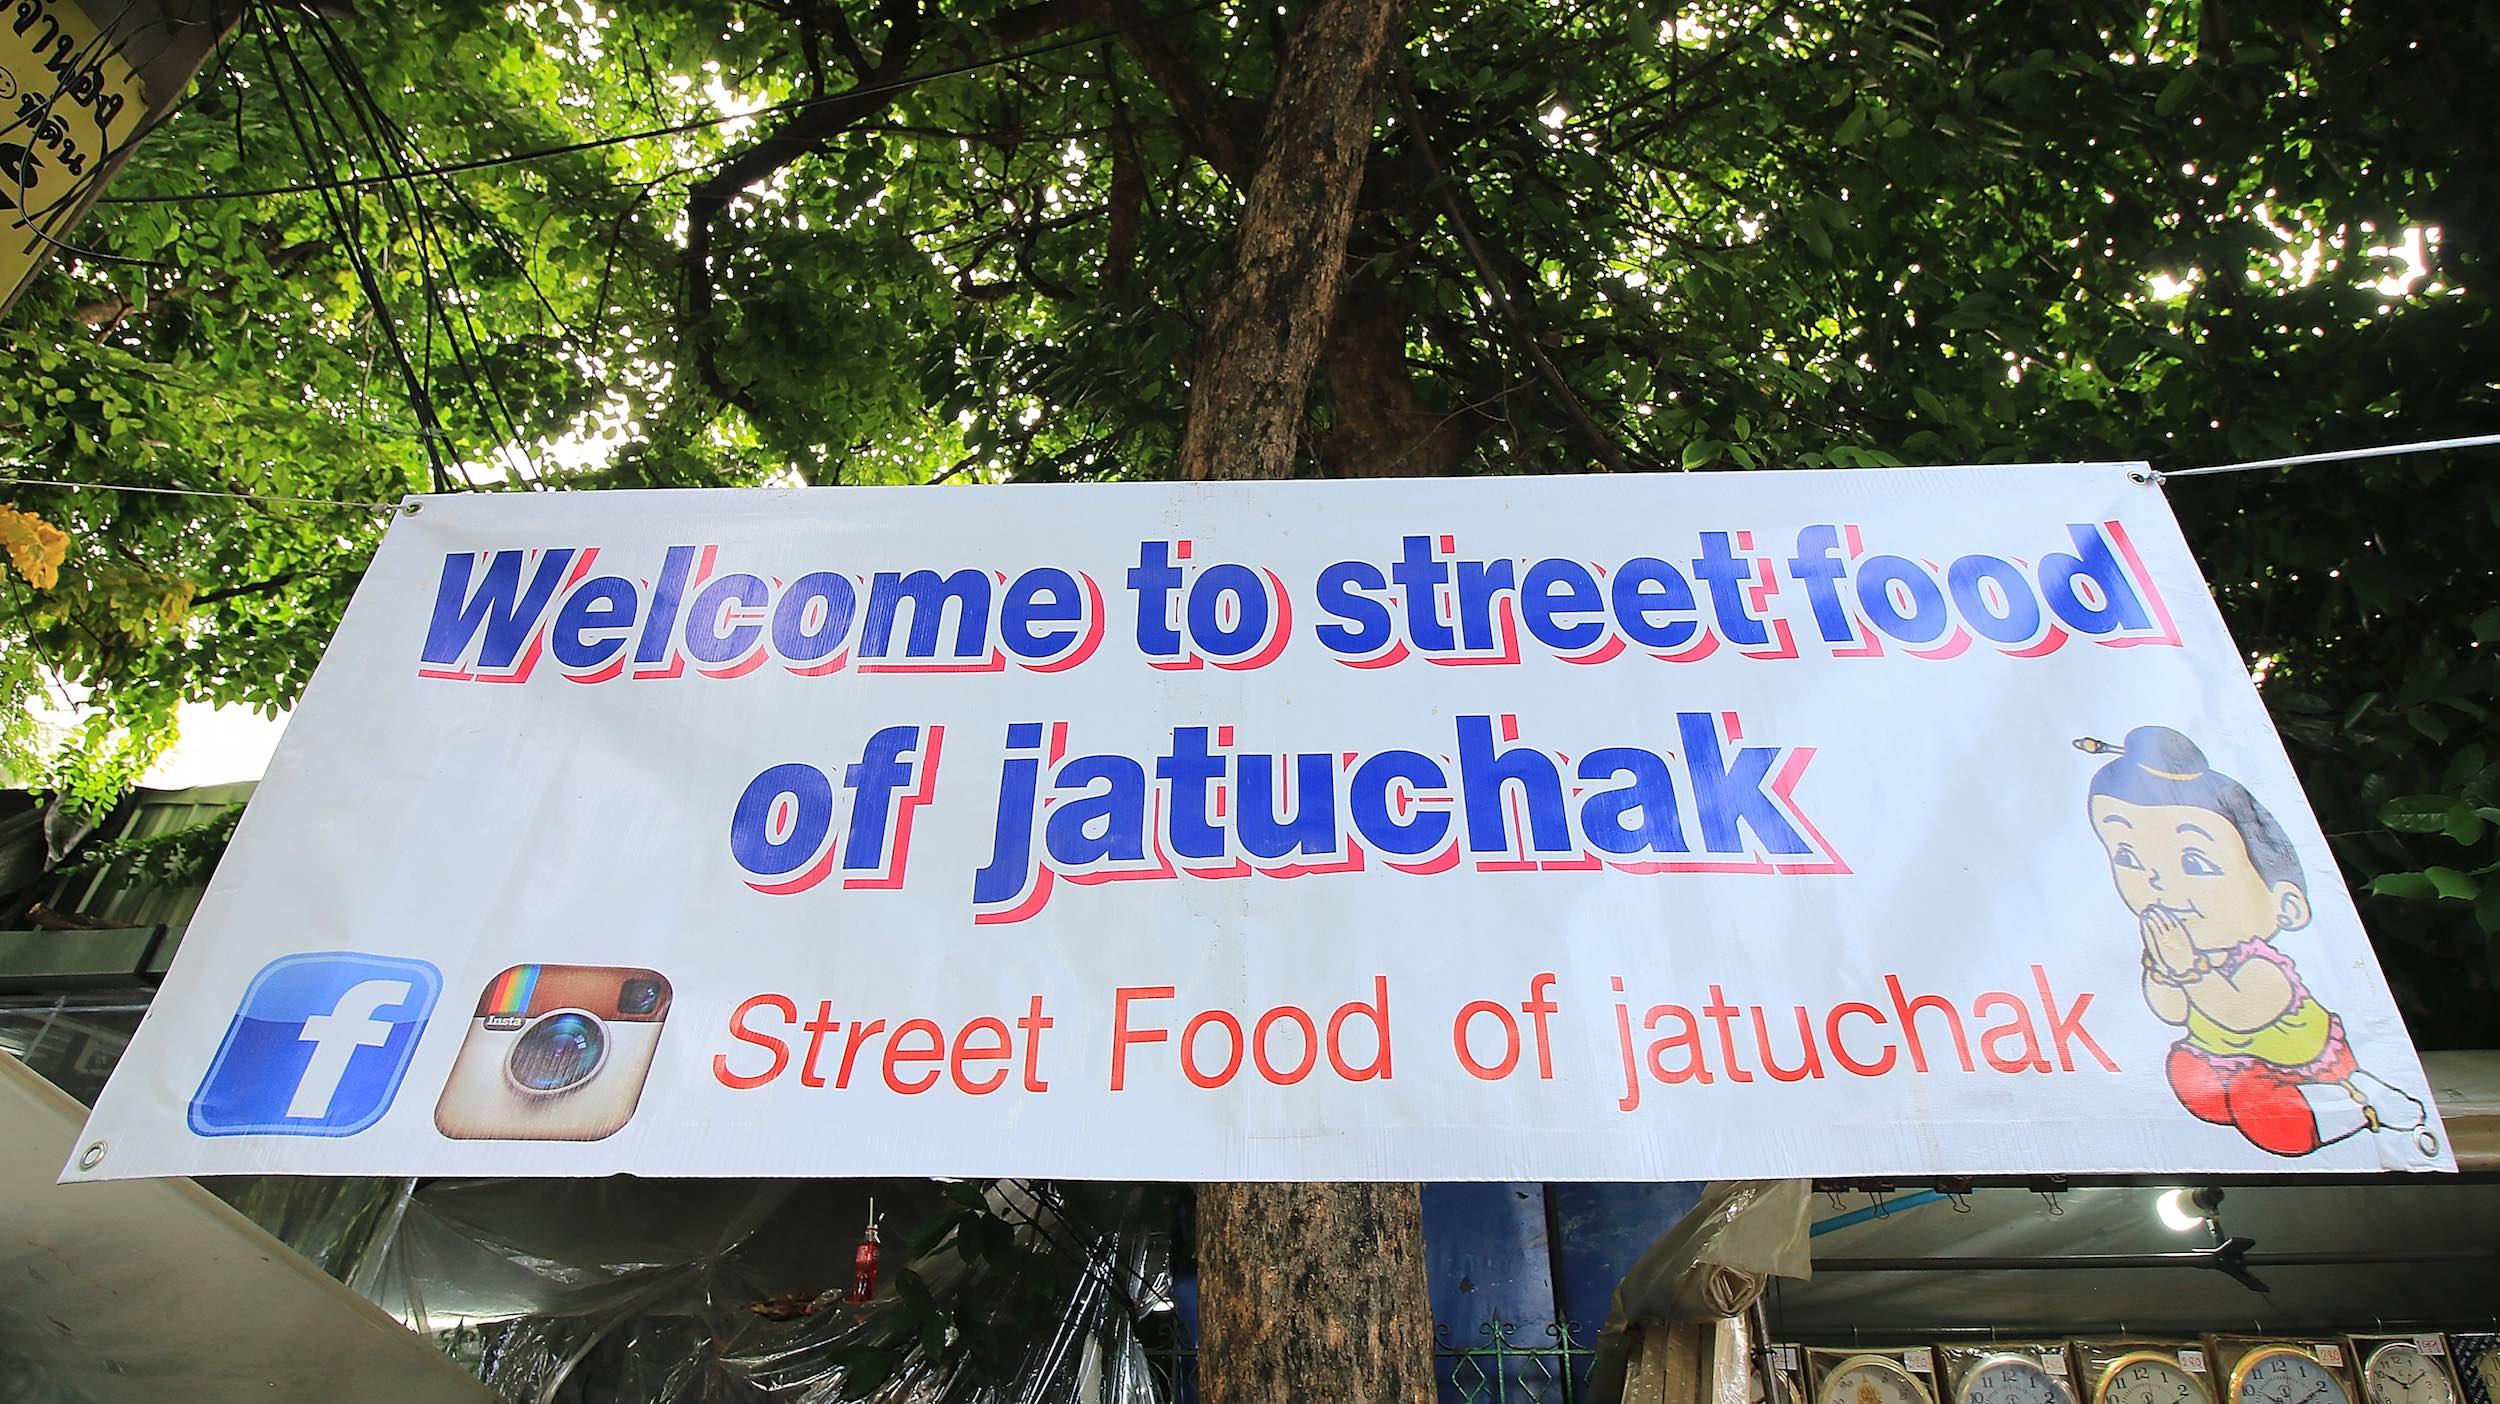 Chatuchak_Weekend_Market_Bangkok_Food_Sign.jpg